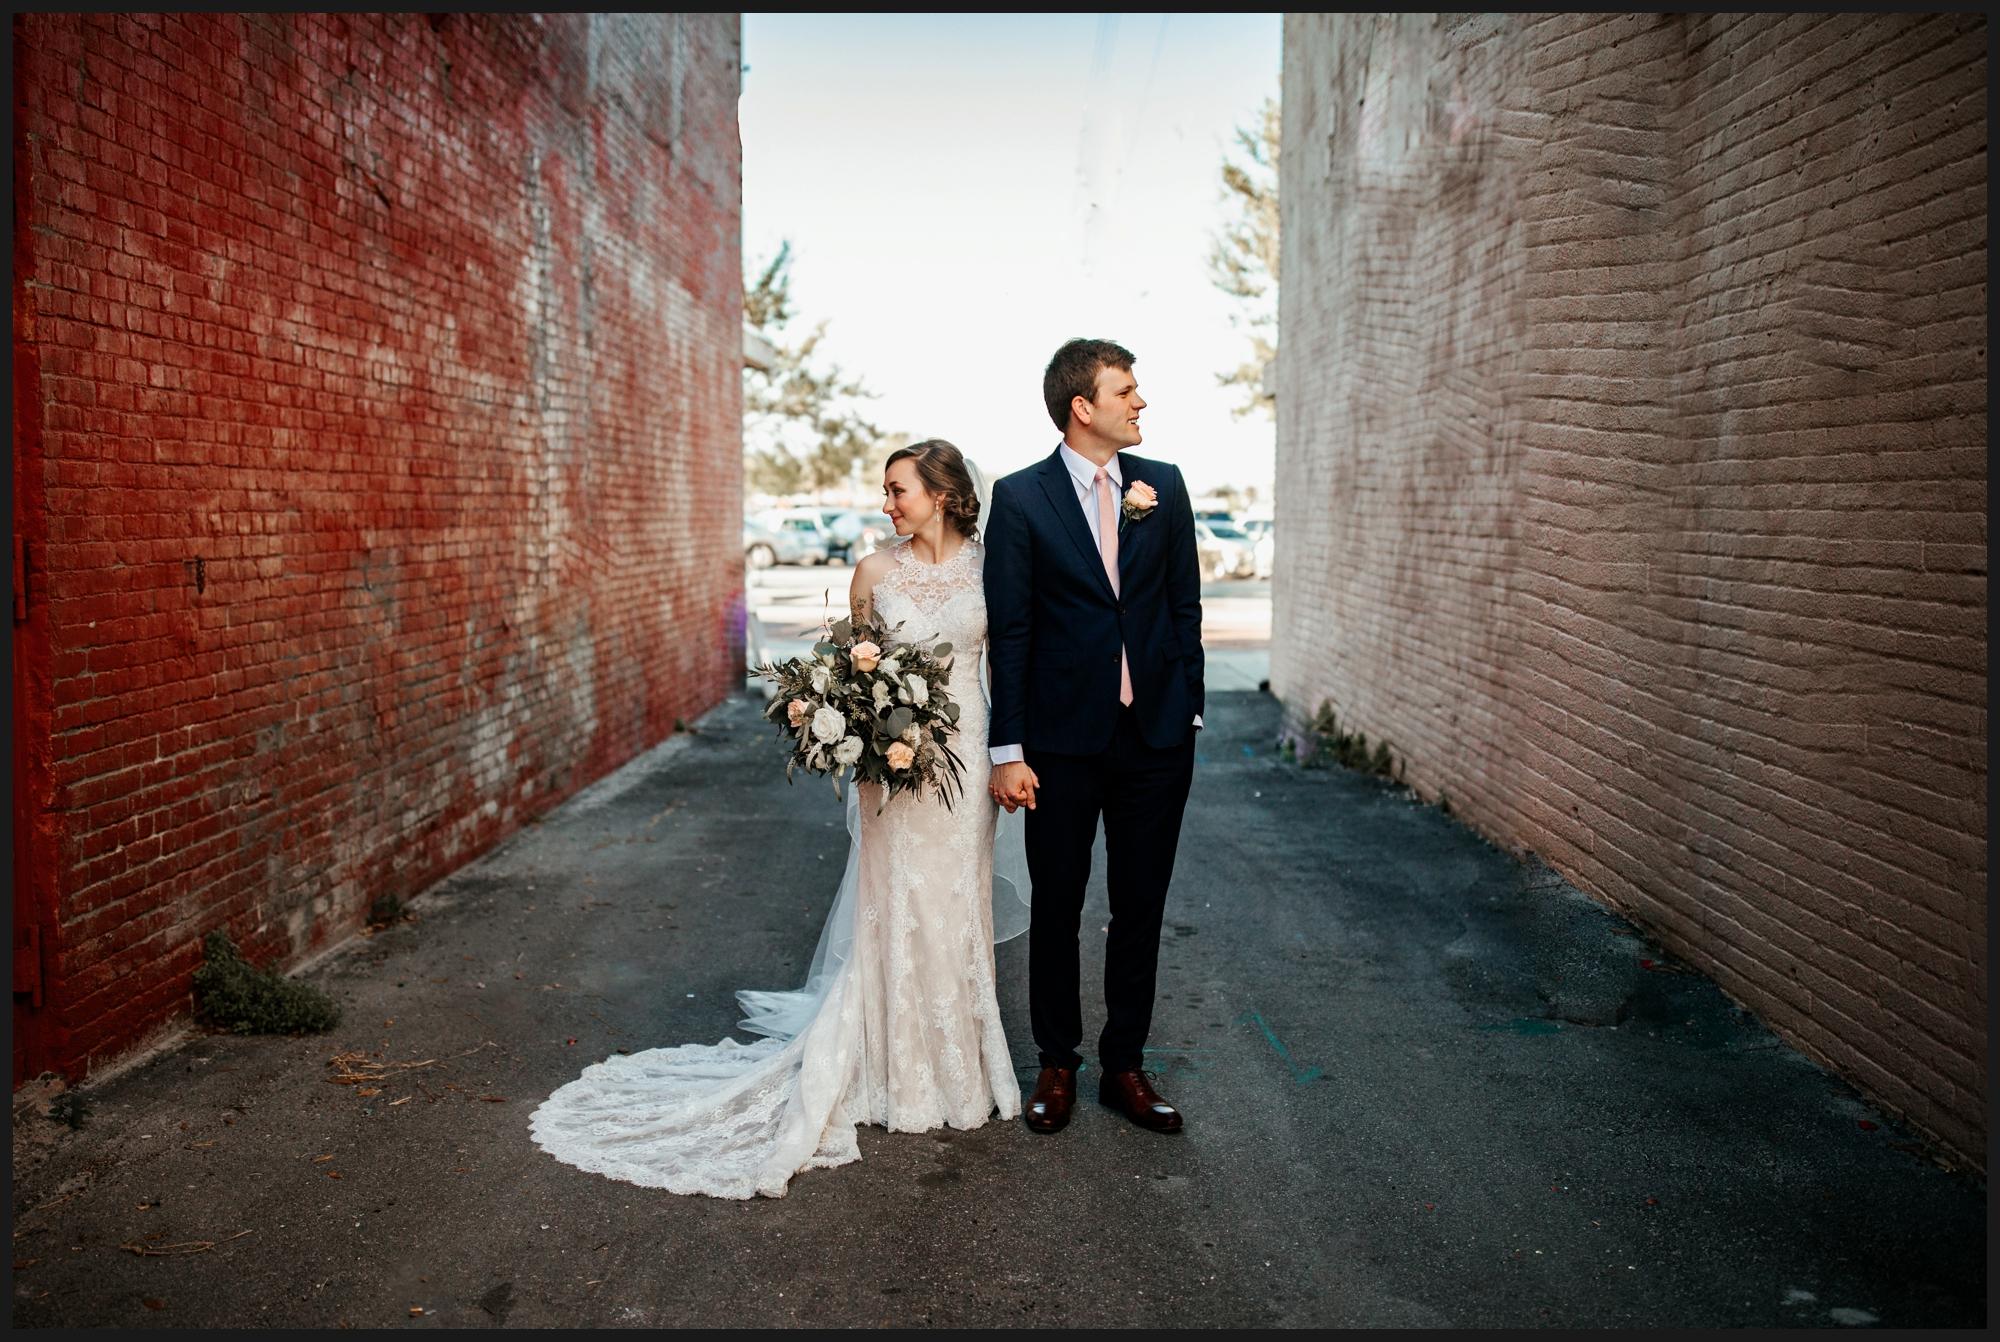 Orlando-Wedding-Photographer-destination-wedding-photographer-florida-wedding-photographer-bohemian-wedding-photographer_1766.jpg